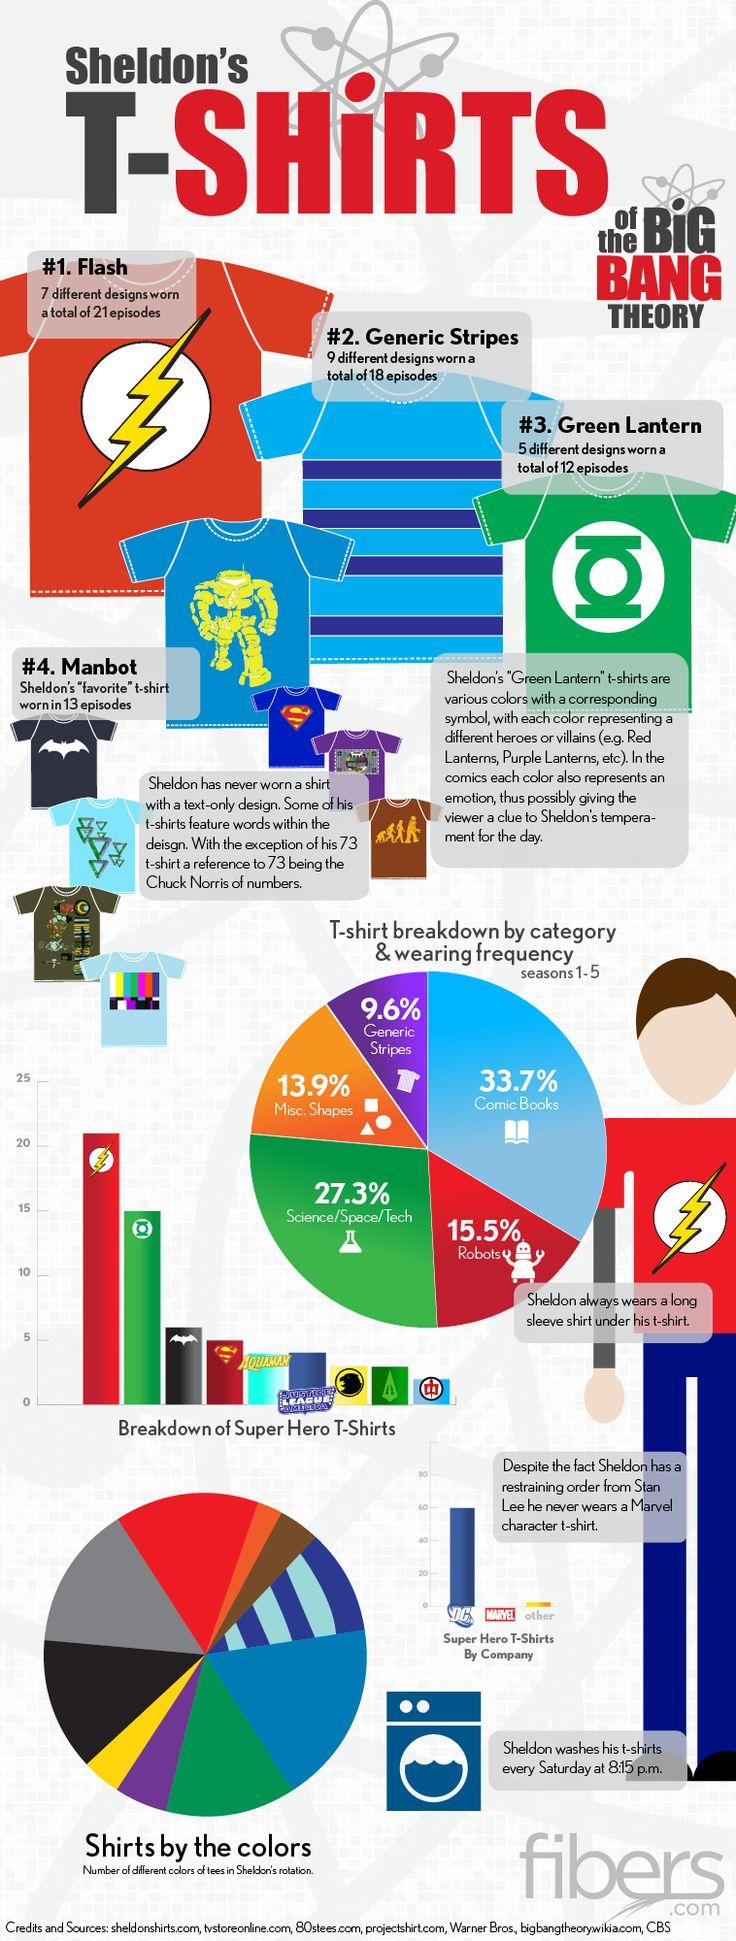 Sheldon's T-Shirts // 'The Big Bang Theory'